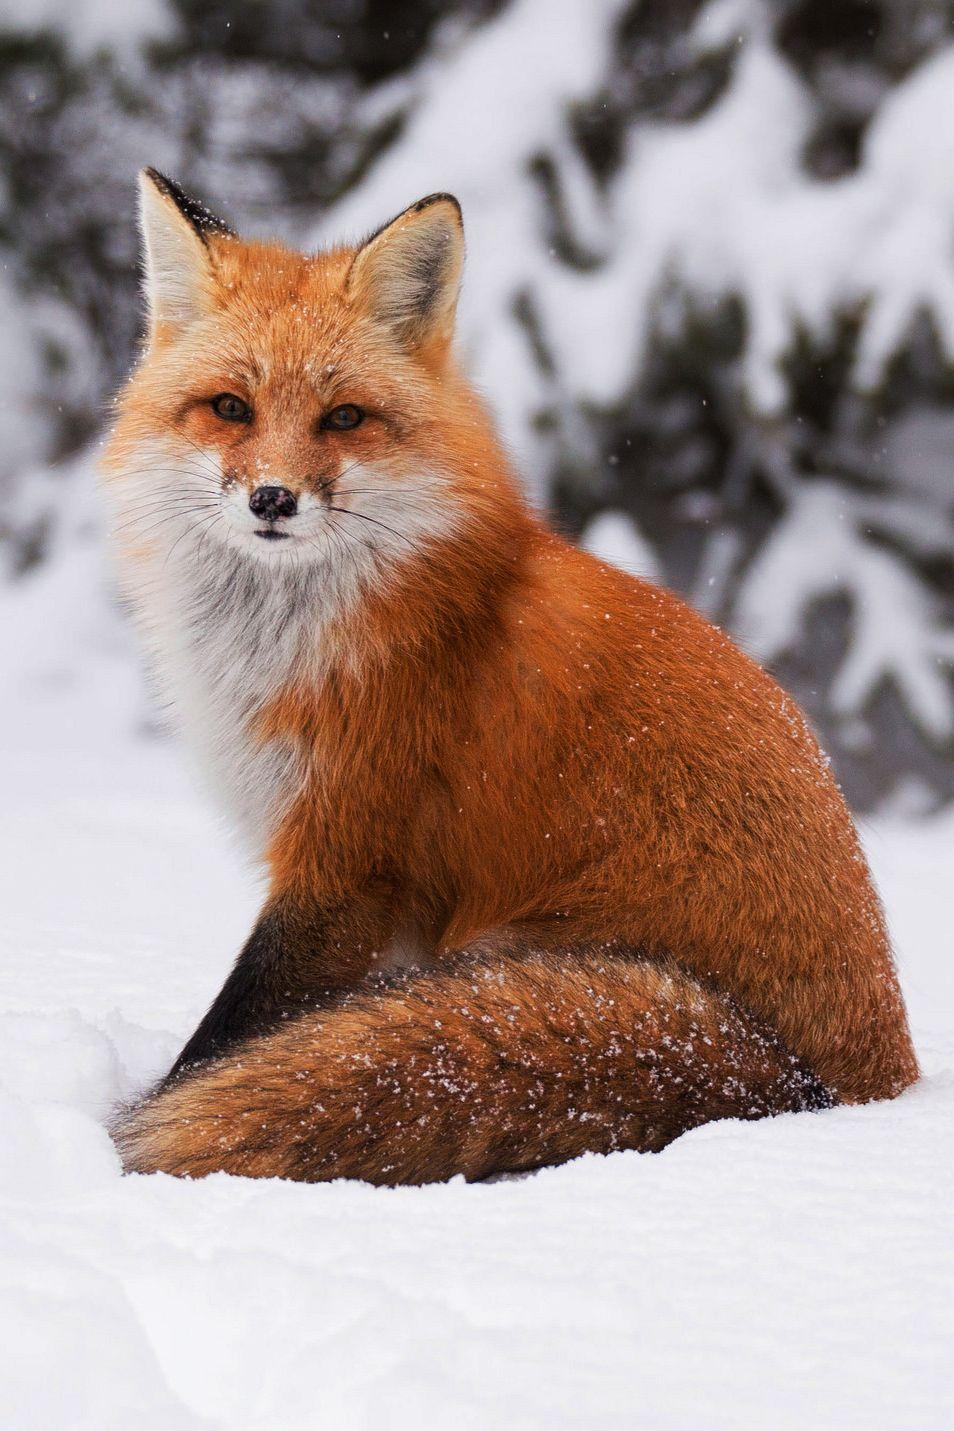 New Post On Travel Story Fuchs Haustier Niedliche Tiere Susseste Haustiere